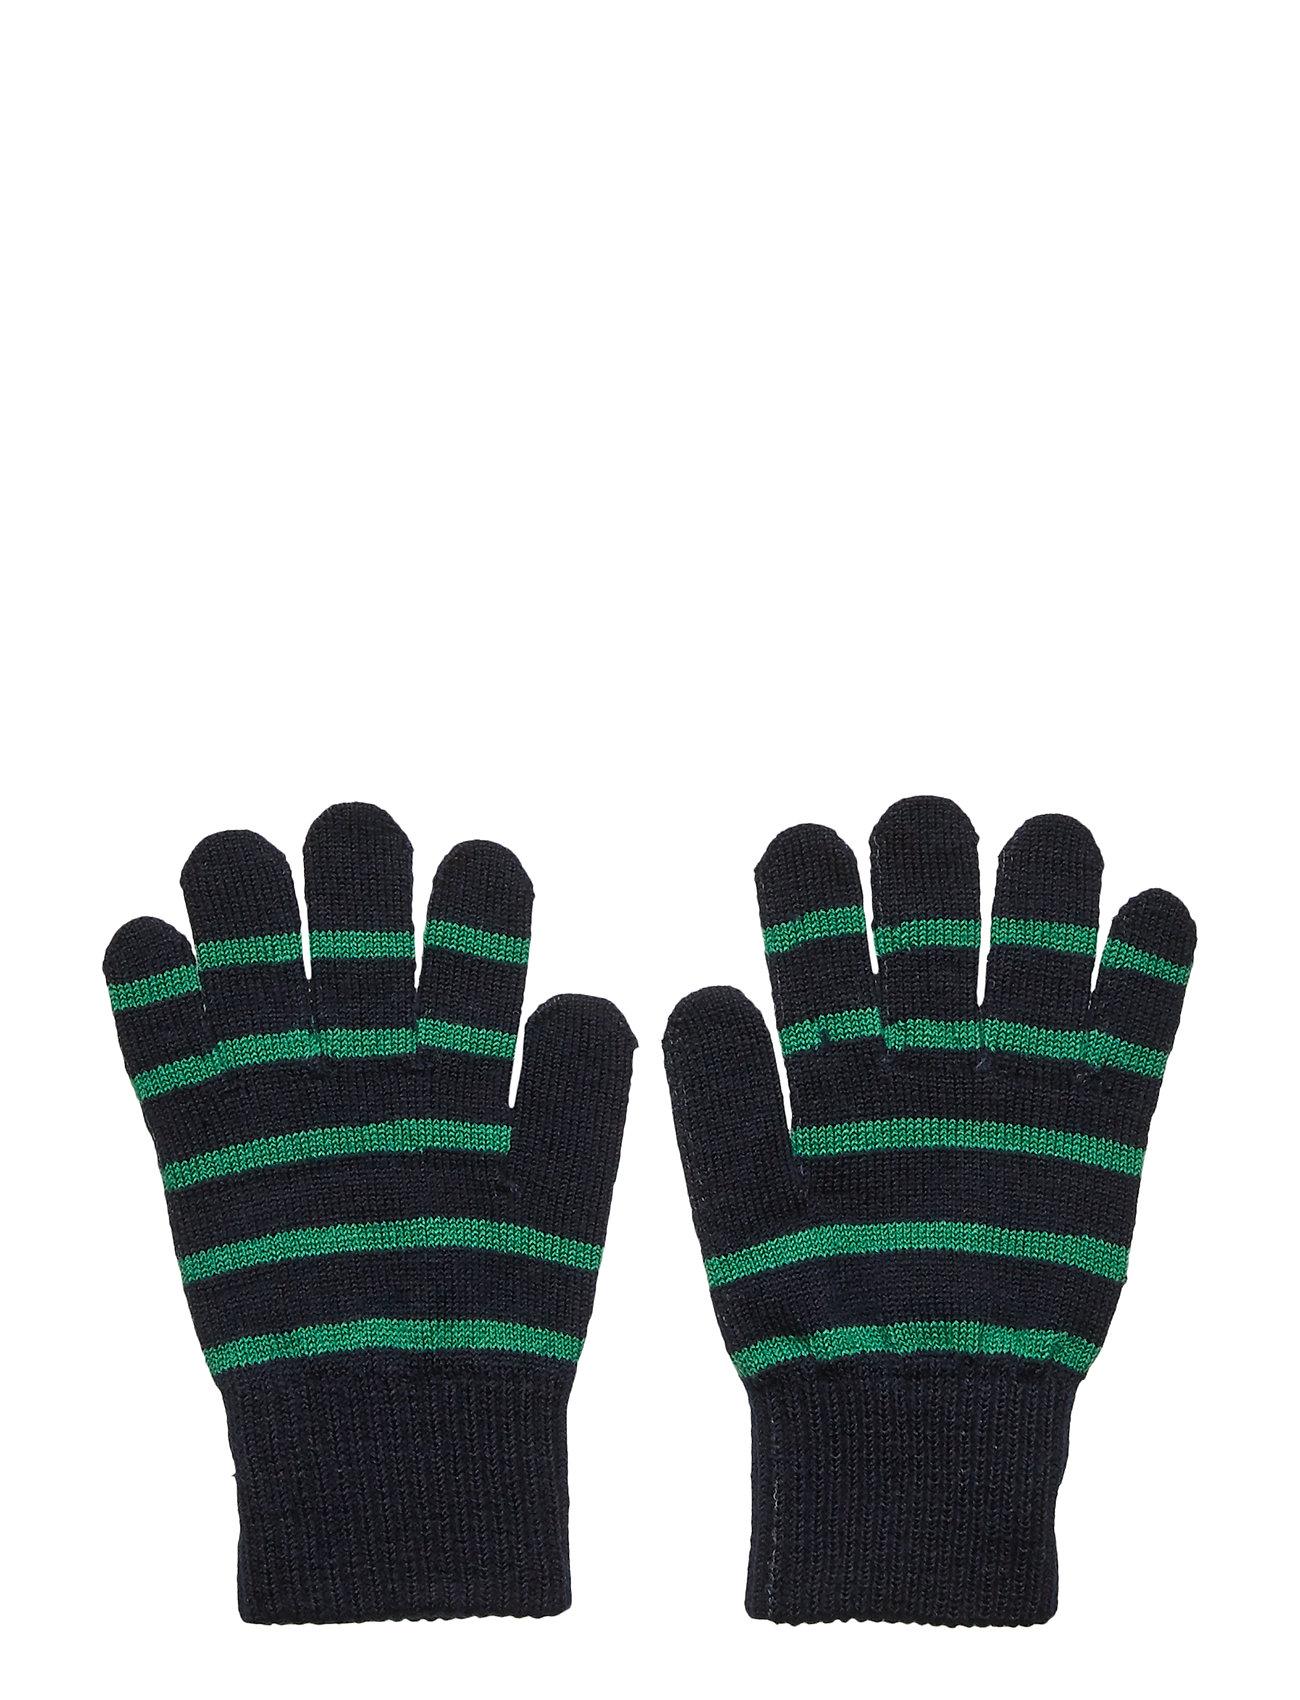 Polarn O. Pyret Glove Wool PO.P Stripe School - DARK SAPPHIRE